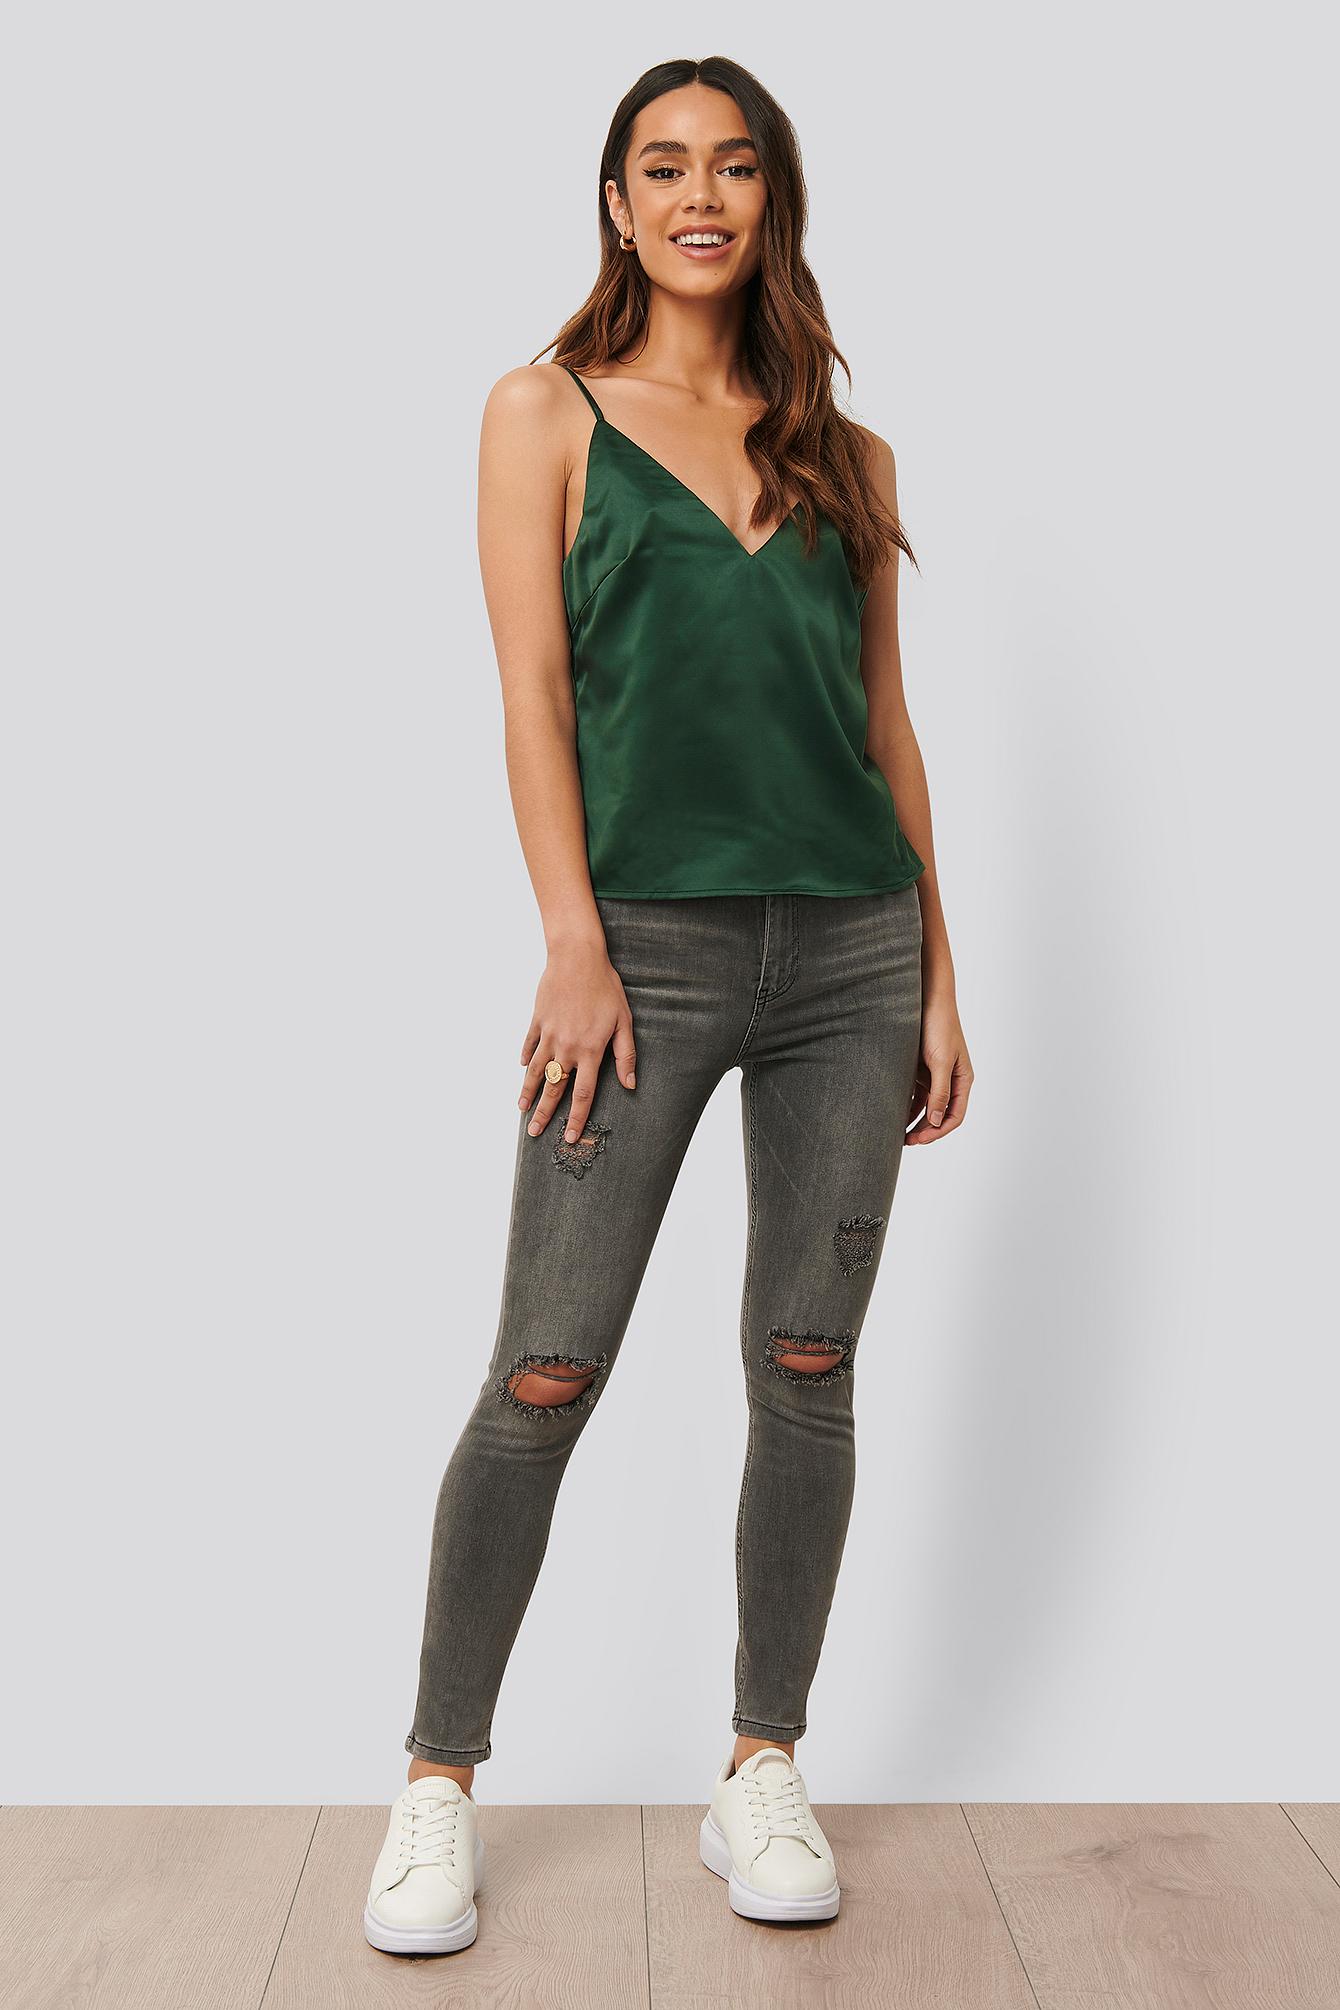 Anika Teller x NA-KD Smalle Jeans Med Huller - Grey